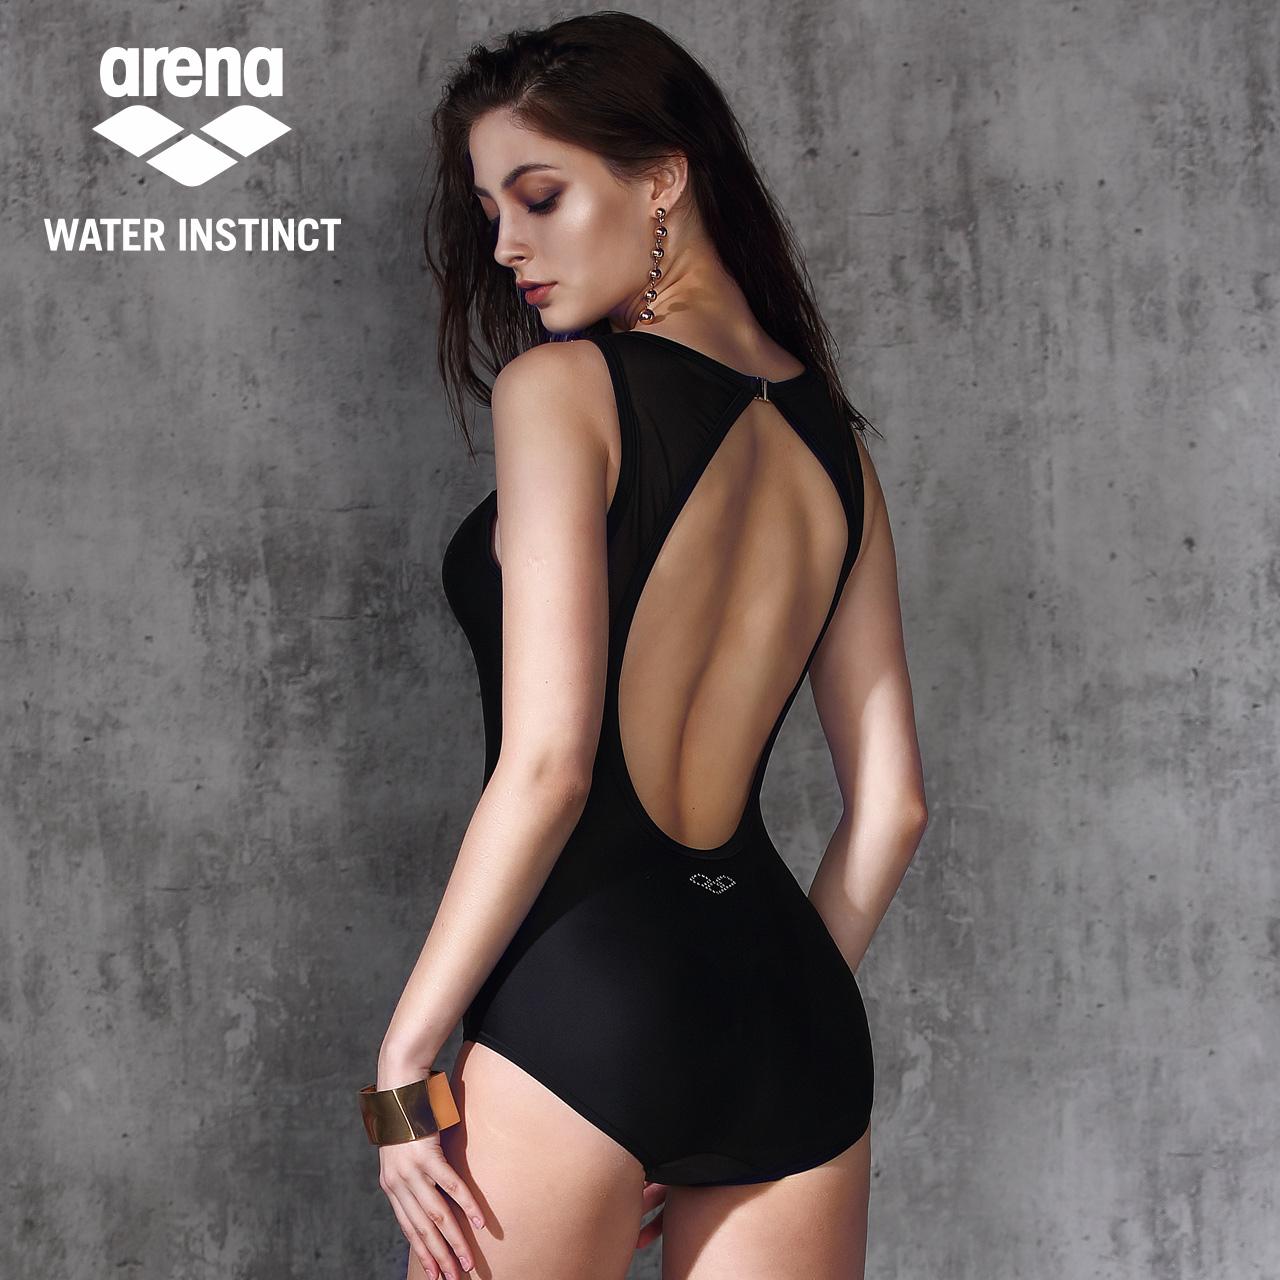 arena阿瑞娜连体泳衣女士 大码保守性感显瘦遮肚游泳衣聚拢泳装